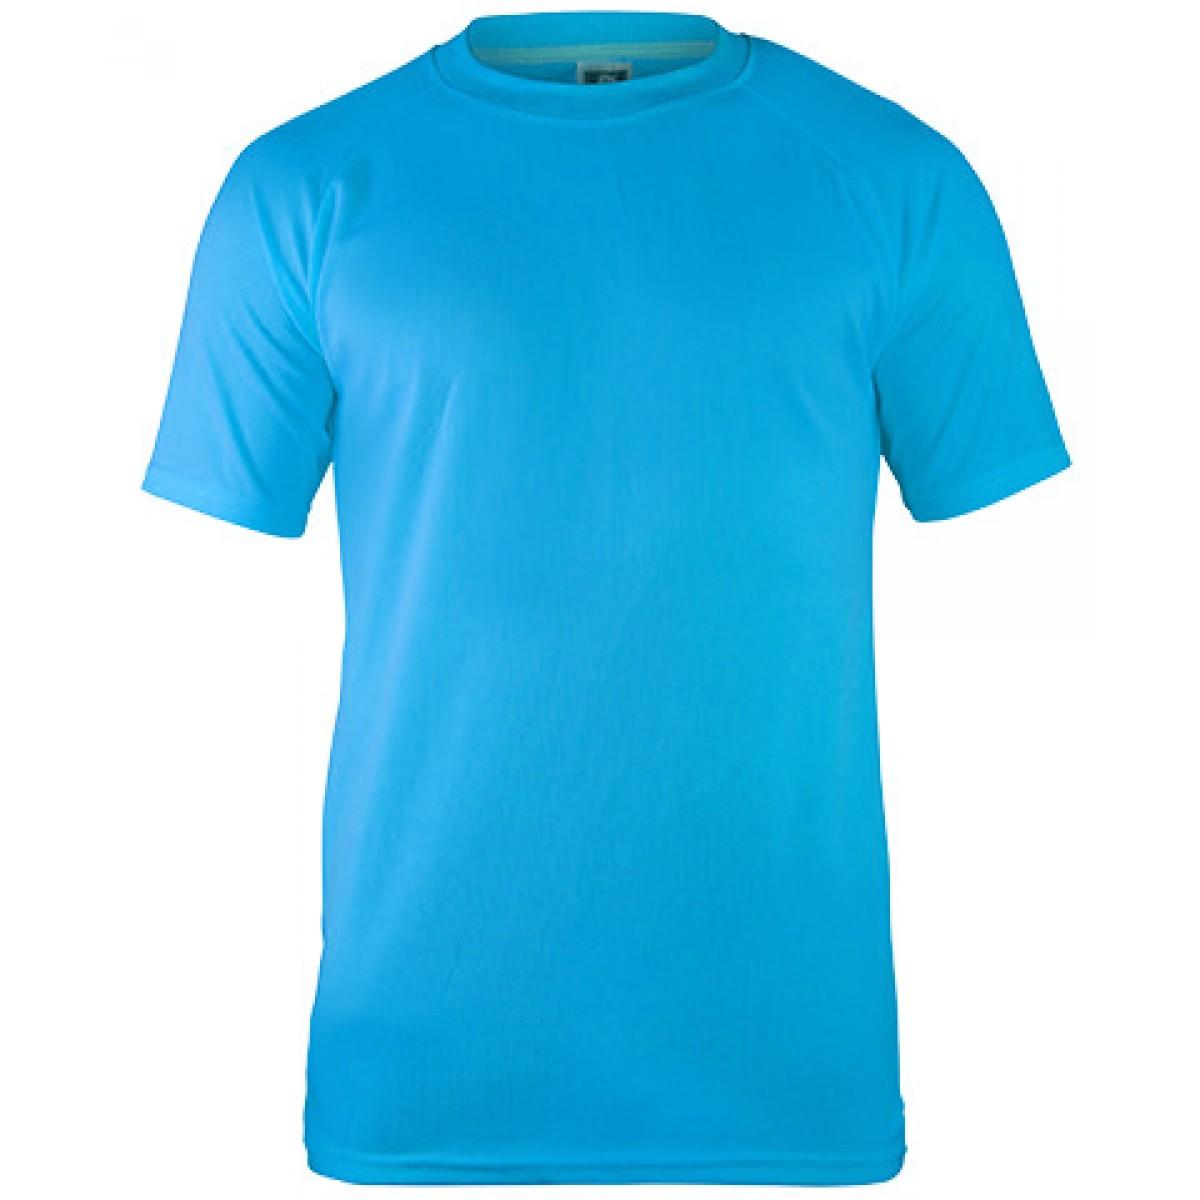 Short Sleeves Mesh Performance T-shirt-Blue-M